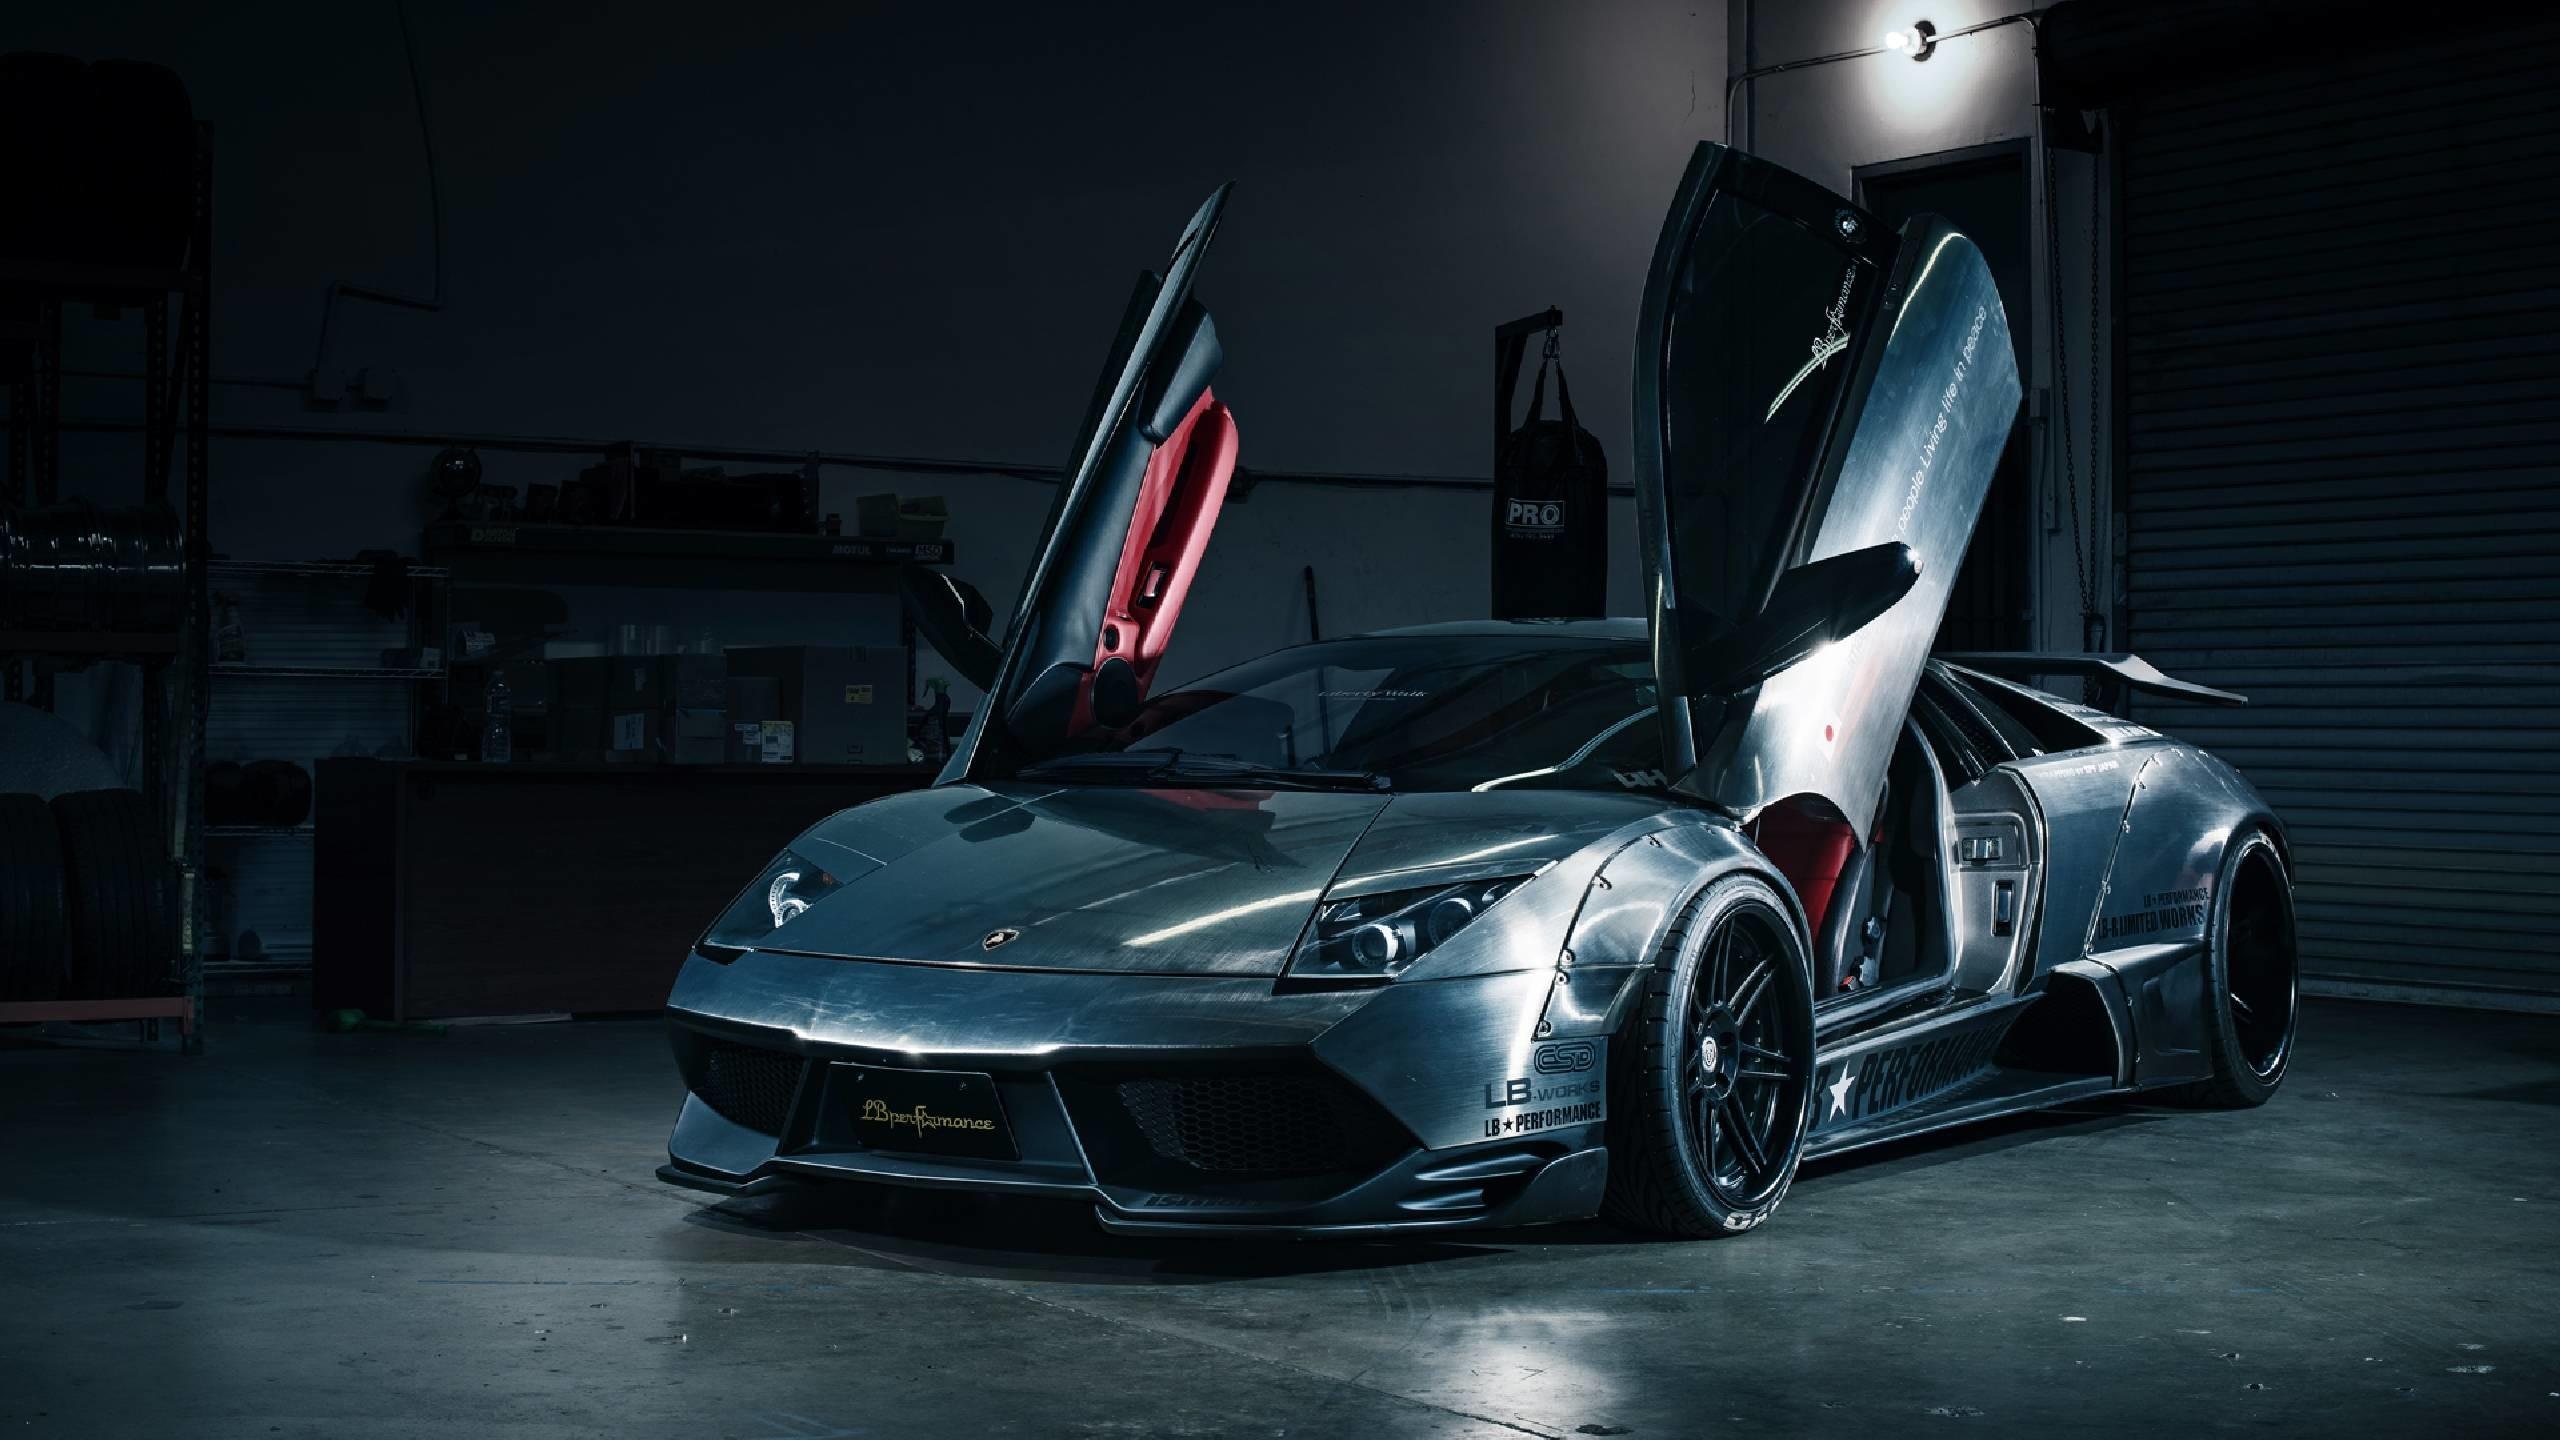 Lamborghini Wallpapers For Galaxy S3 · Lamborghini Wallpapers .